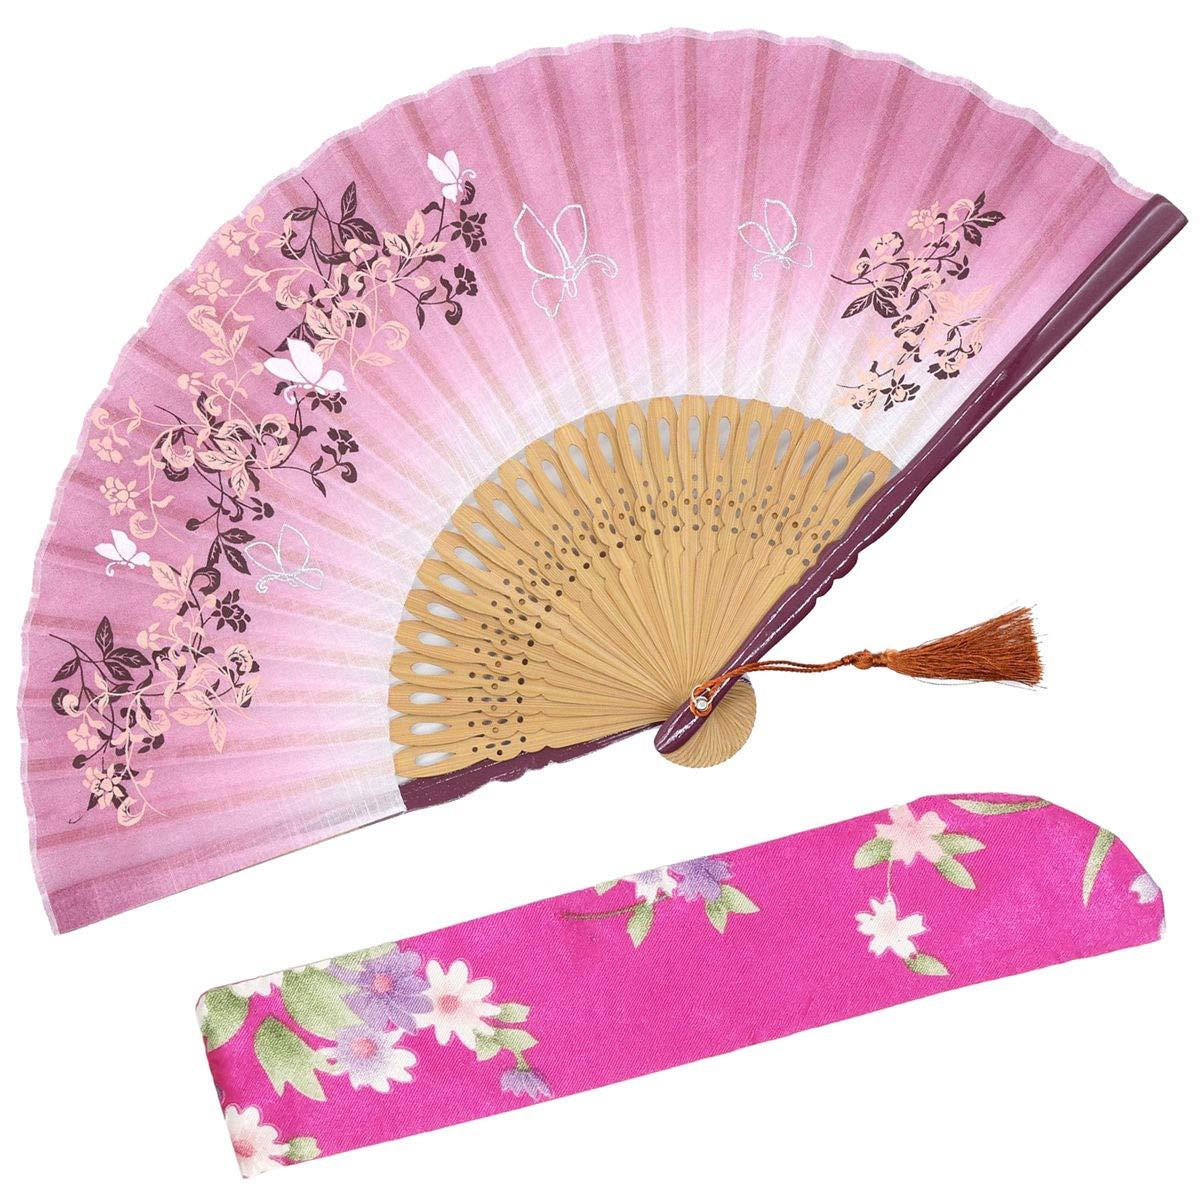 Abanico de japón aventador refresacar